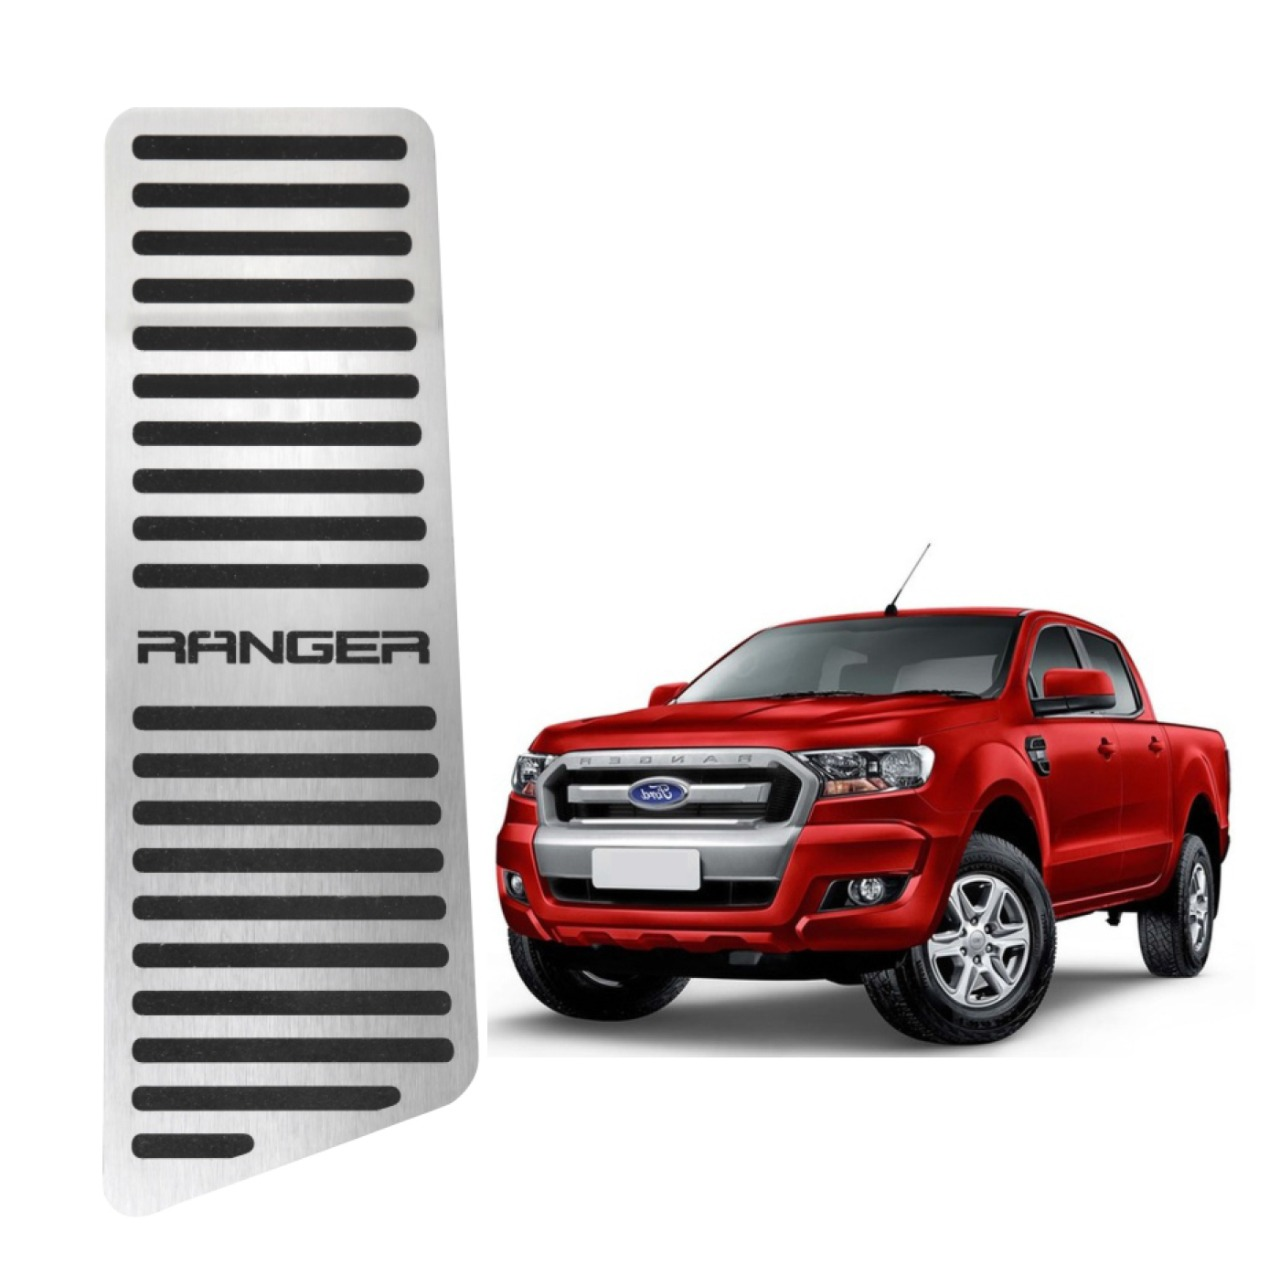 Descanso de Pé Ford Ranger Aço Inox Escovado